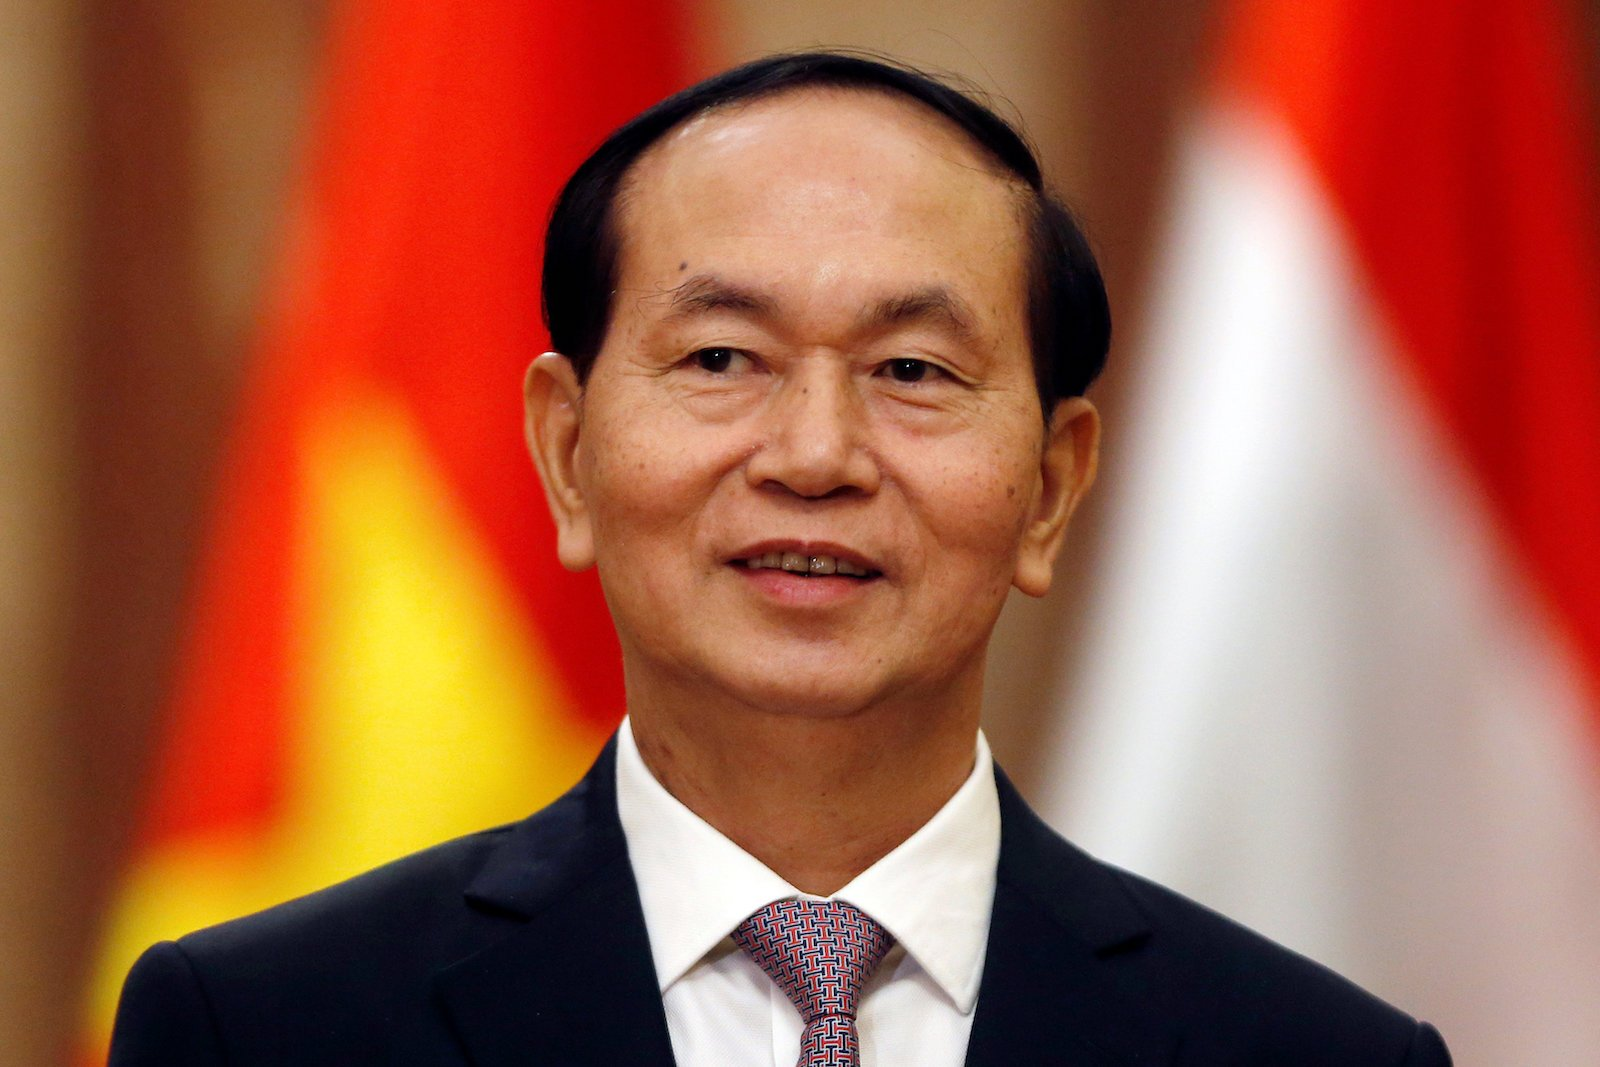 Vietnamese sports betting push goes awry